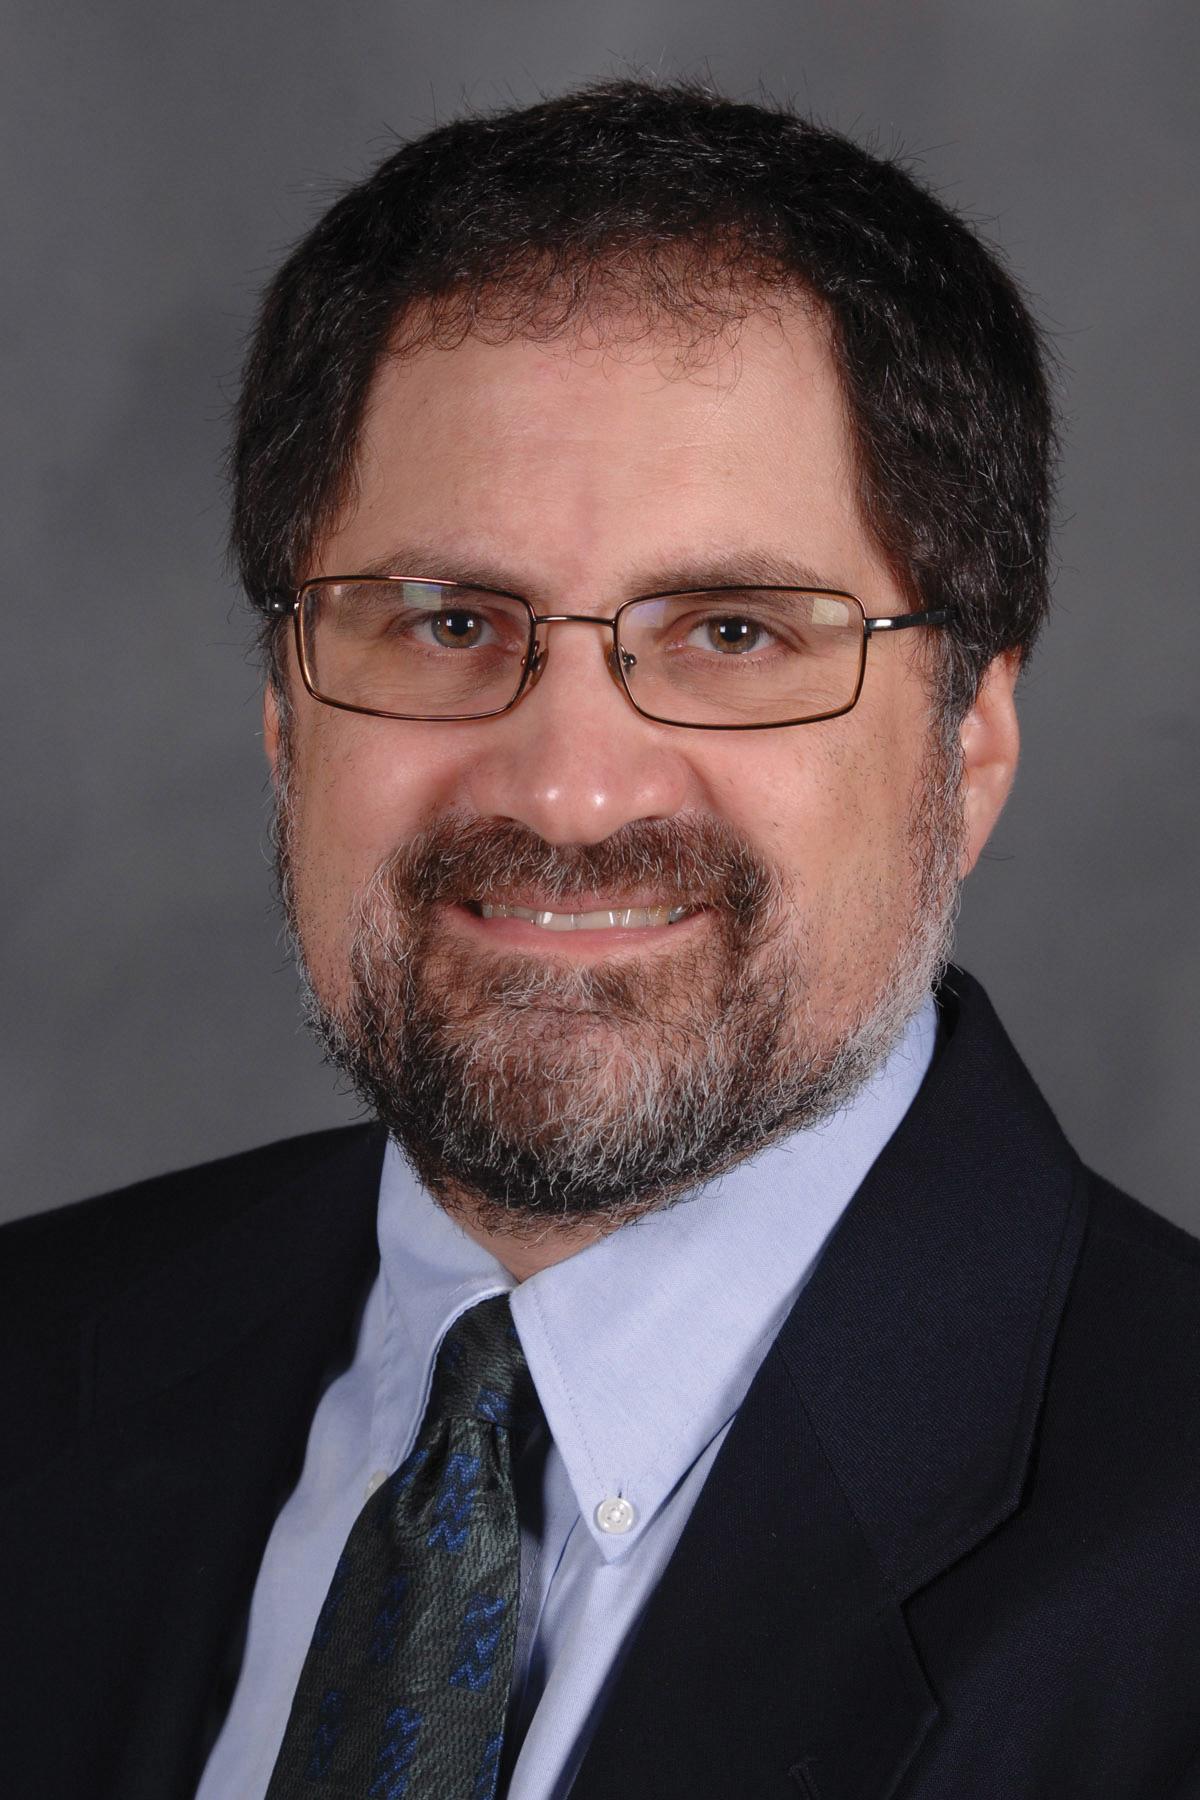 Joesph Ortiz, PhD